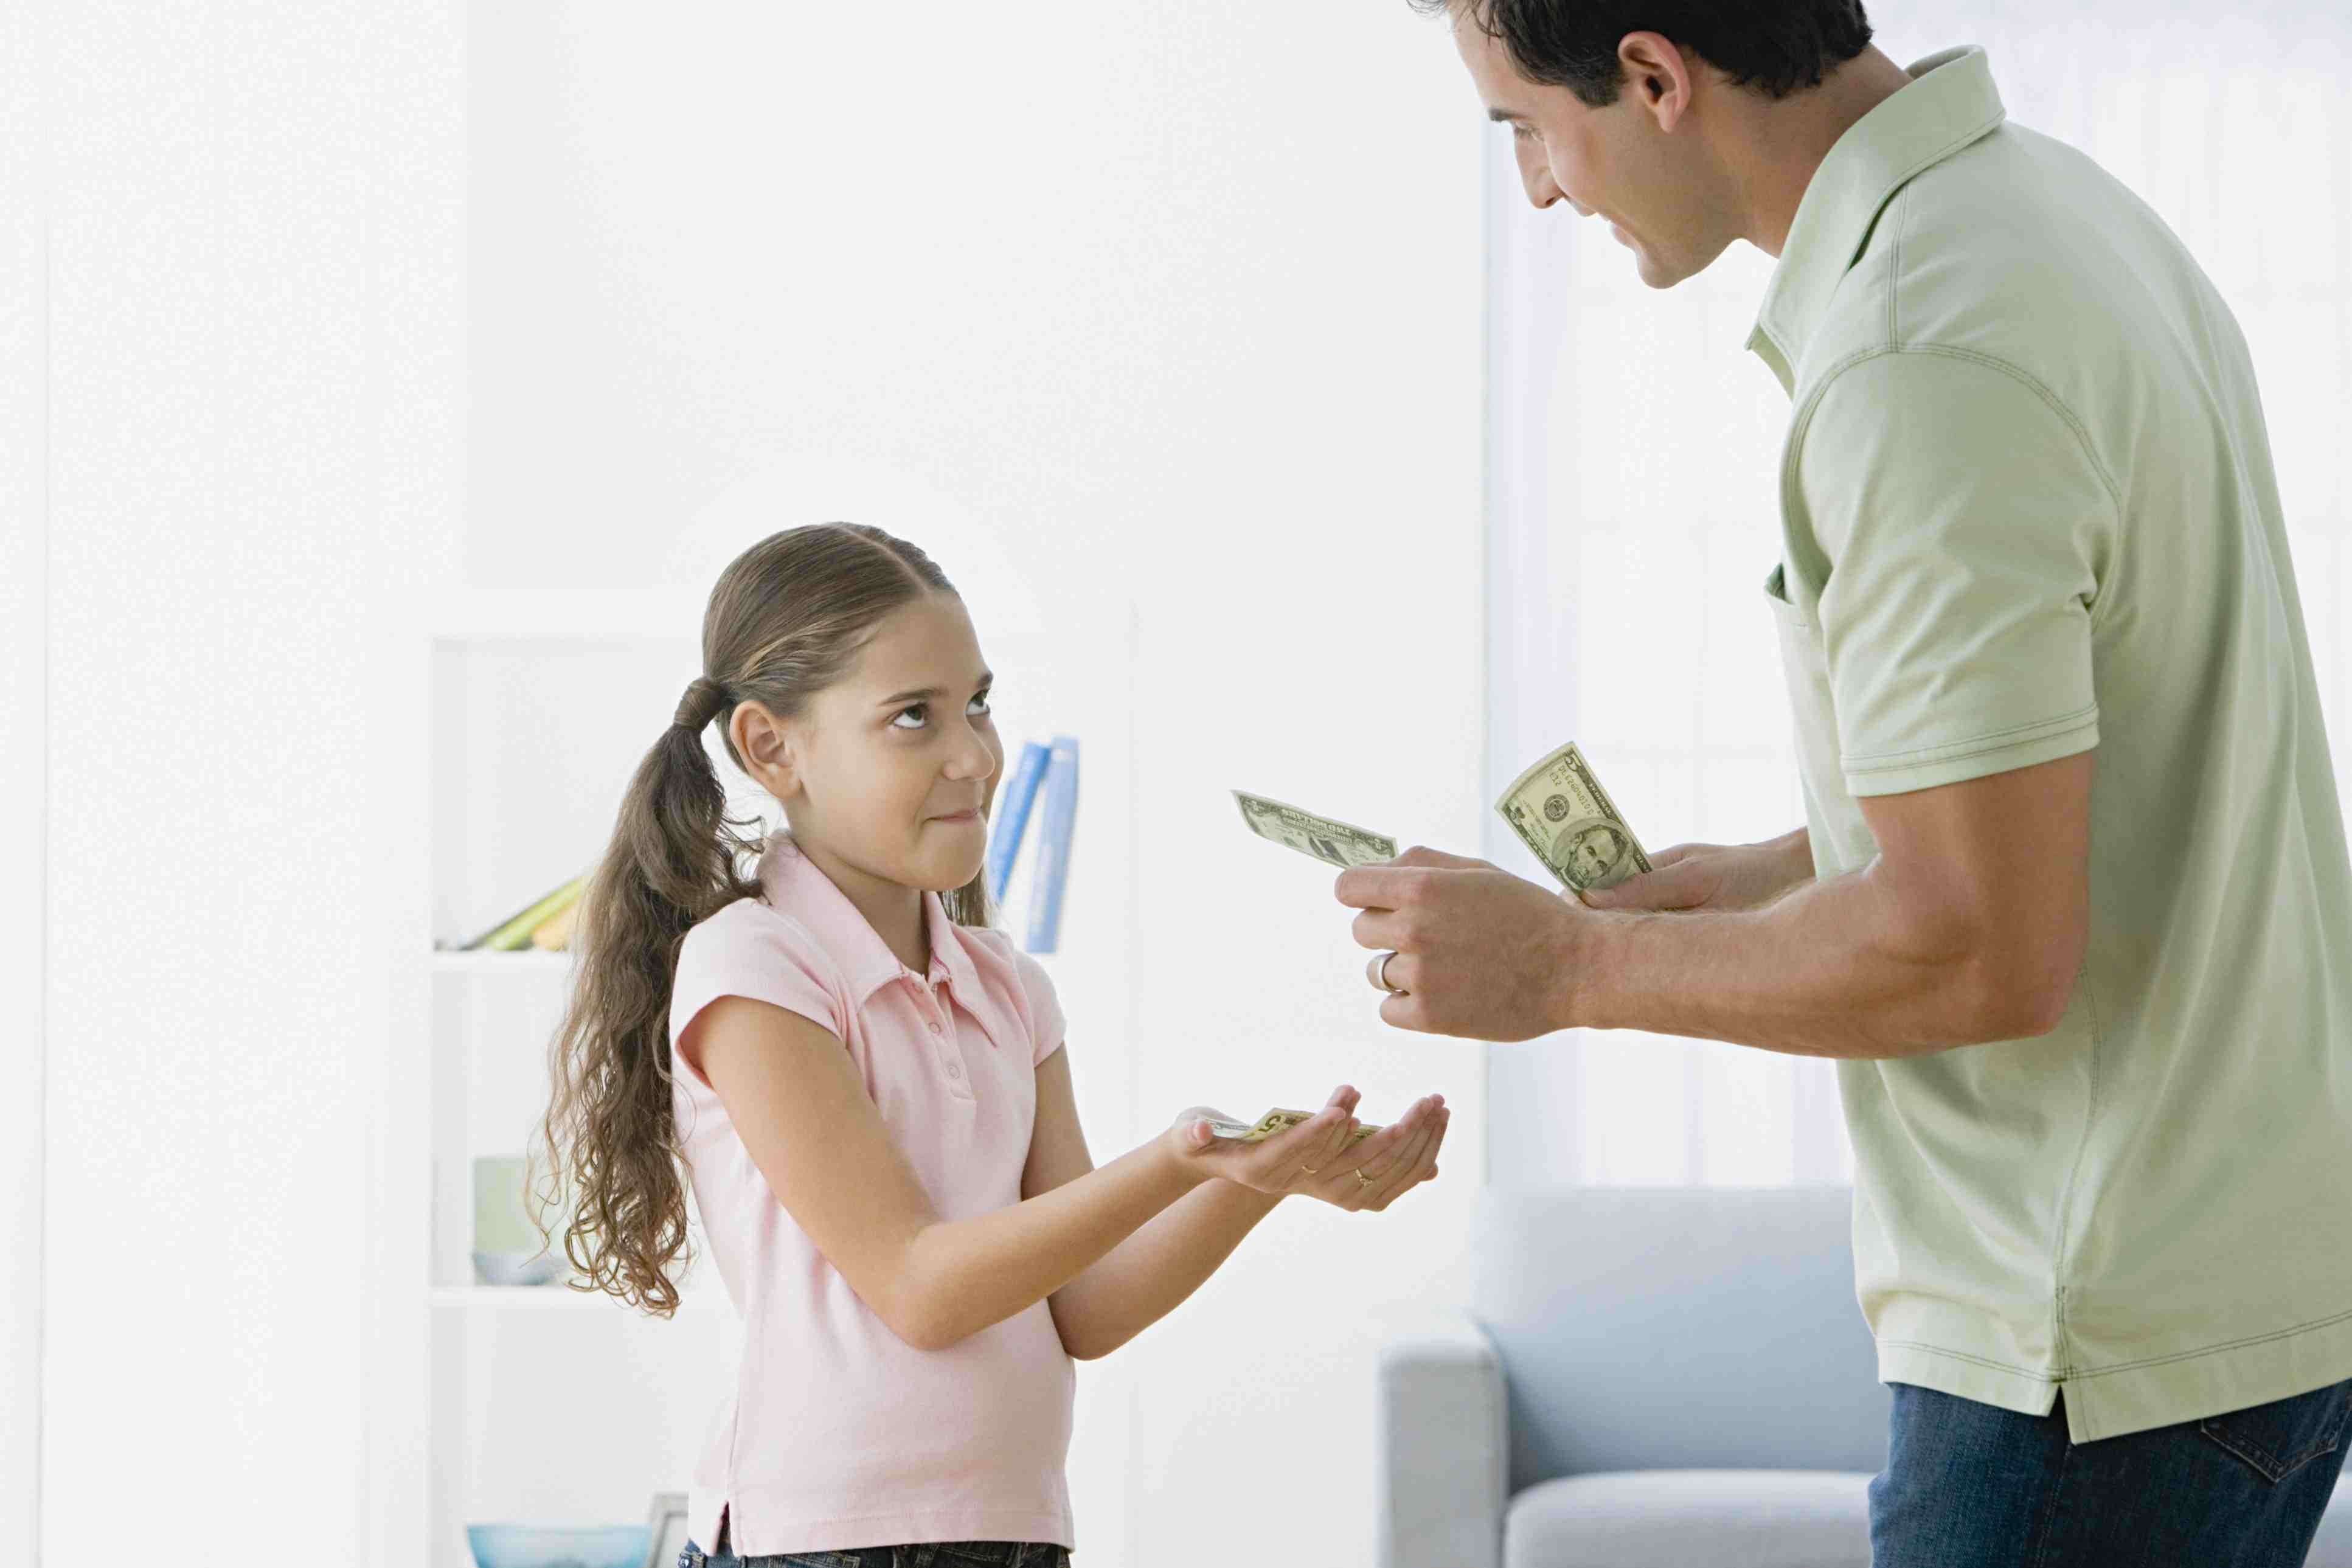 affluenza - girl getting allowance from dad